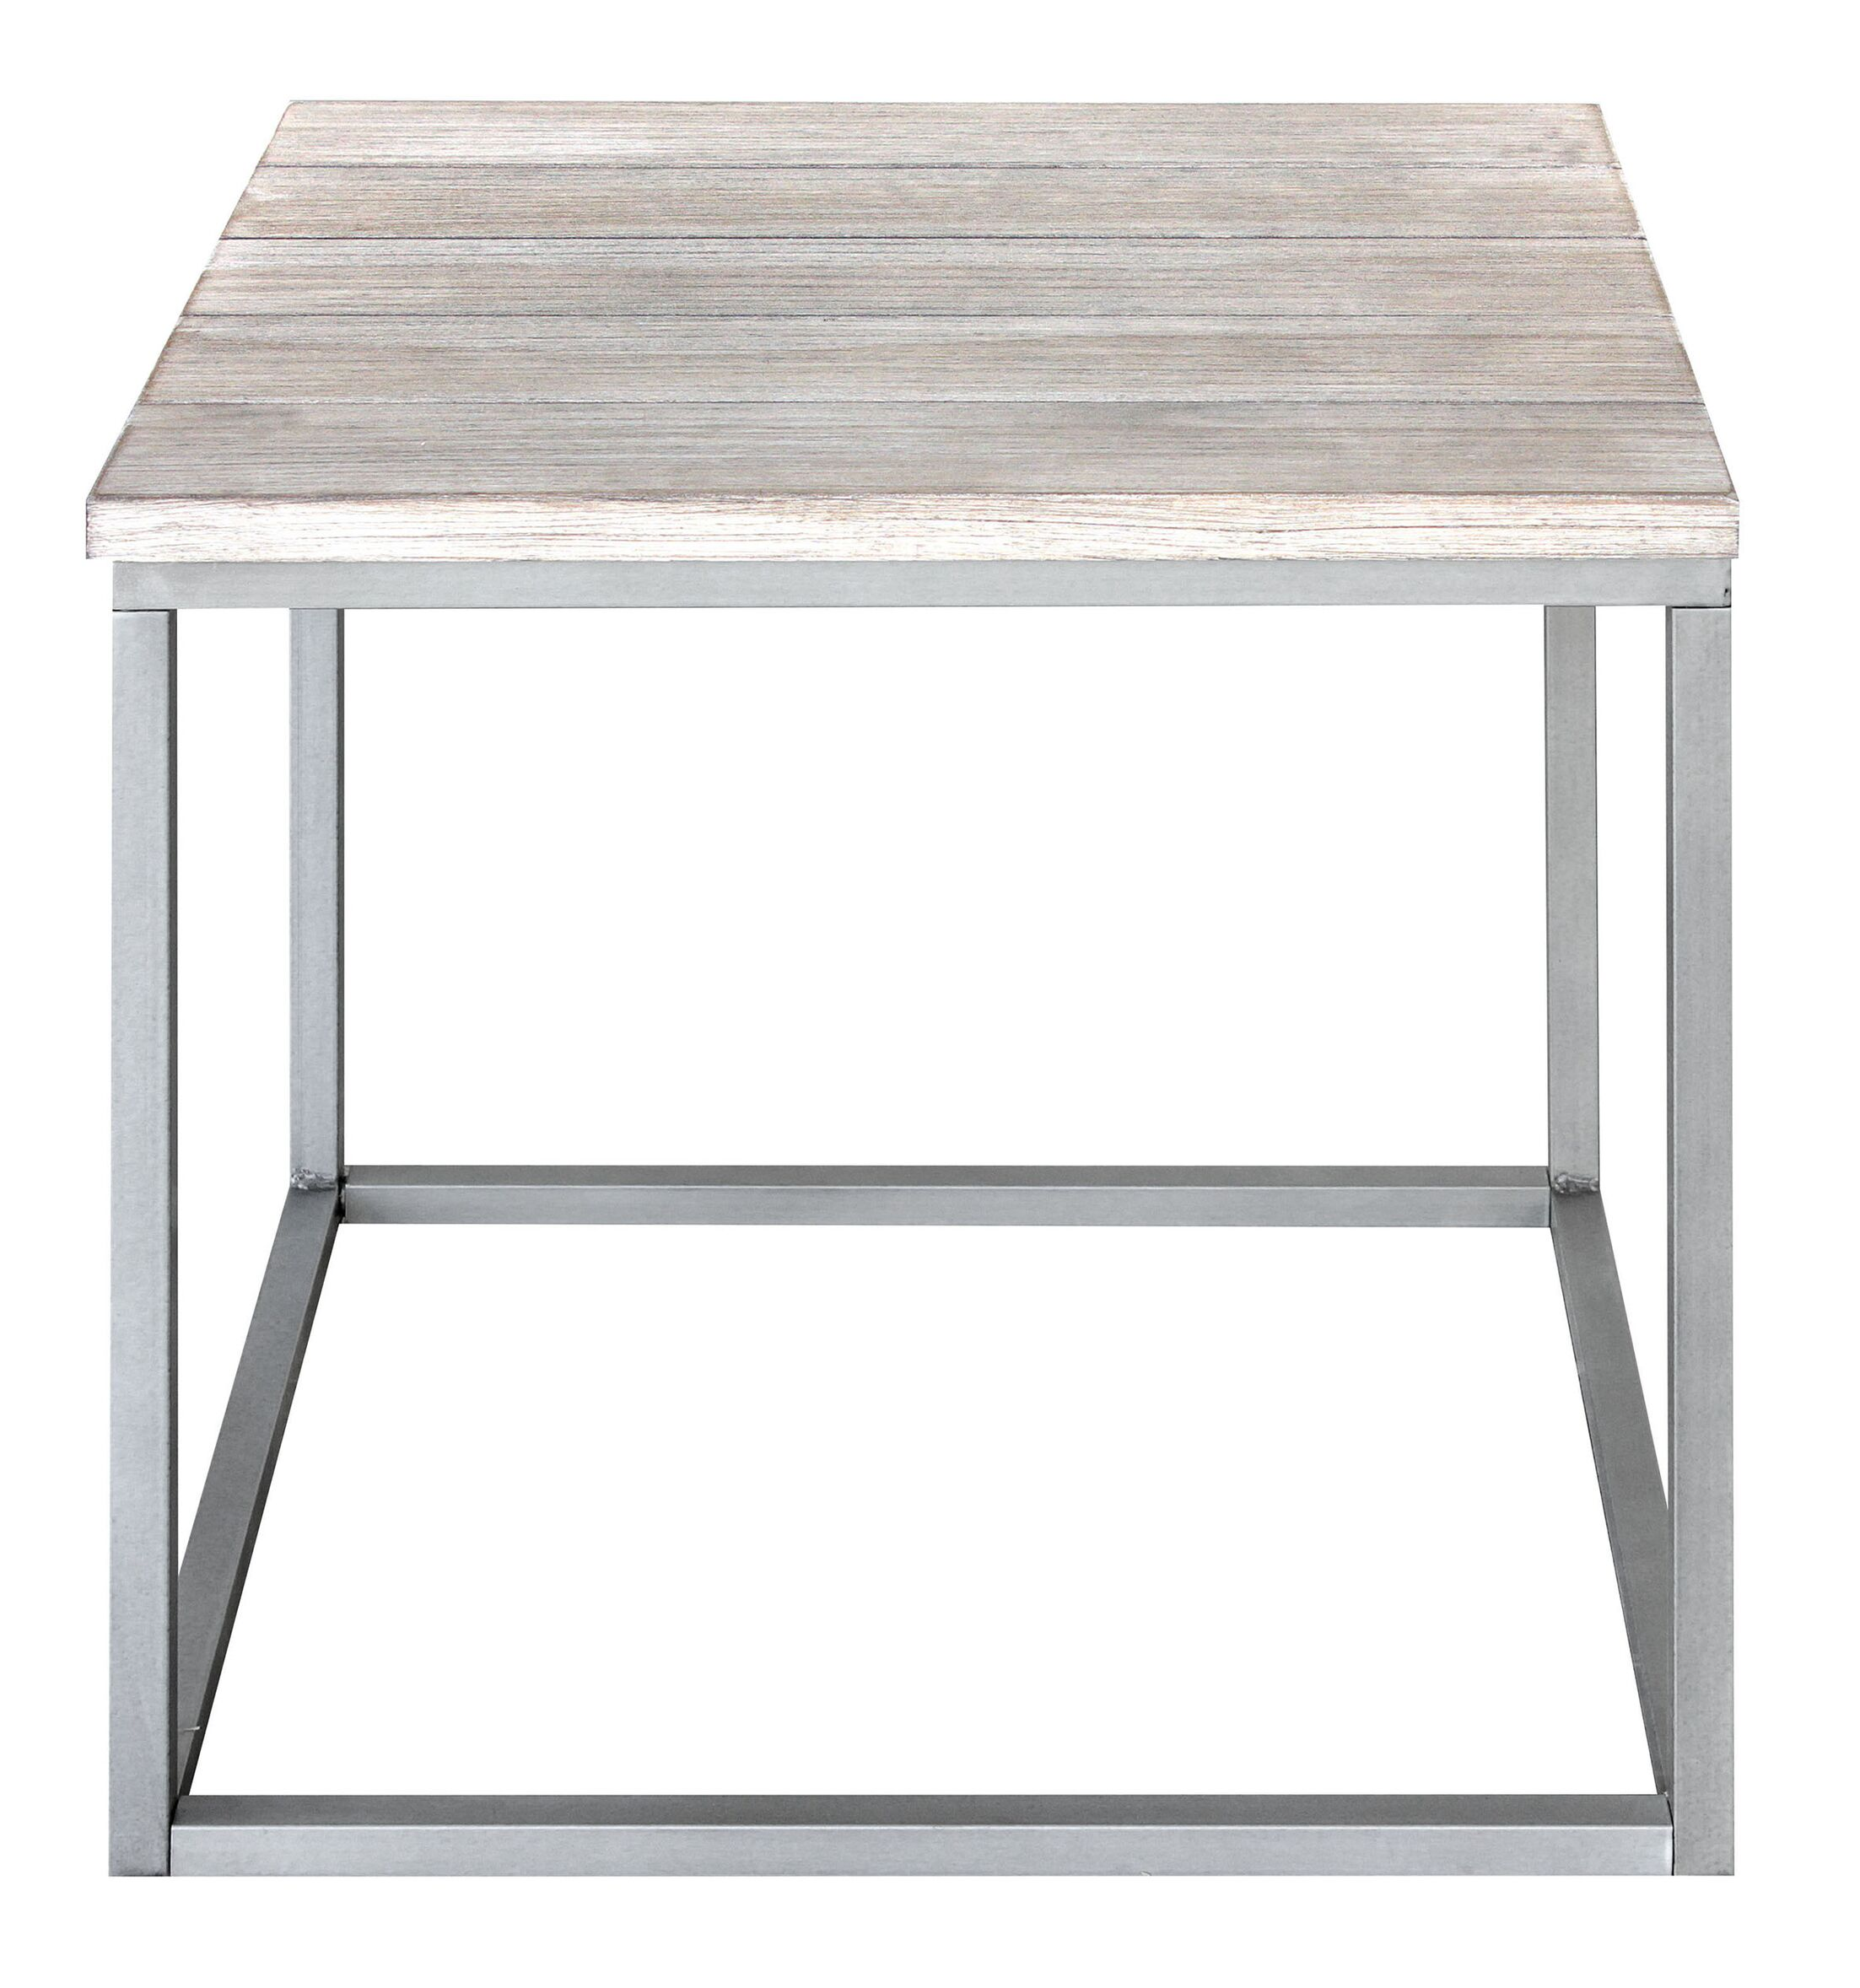 Side Cubic Vintage End Table Color: Vintage White/Gray